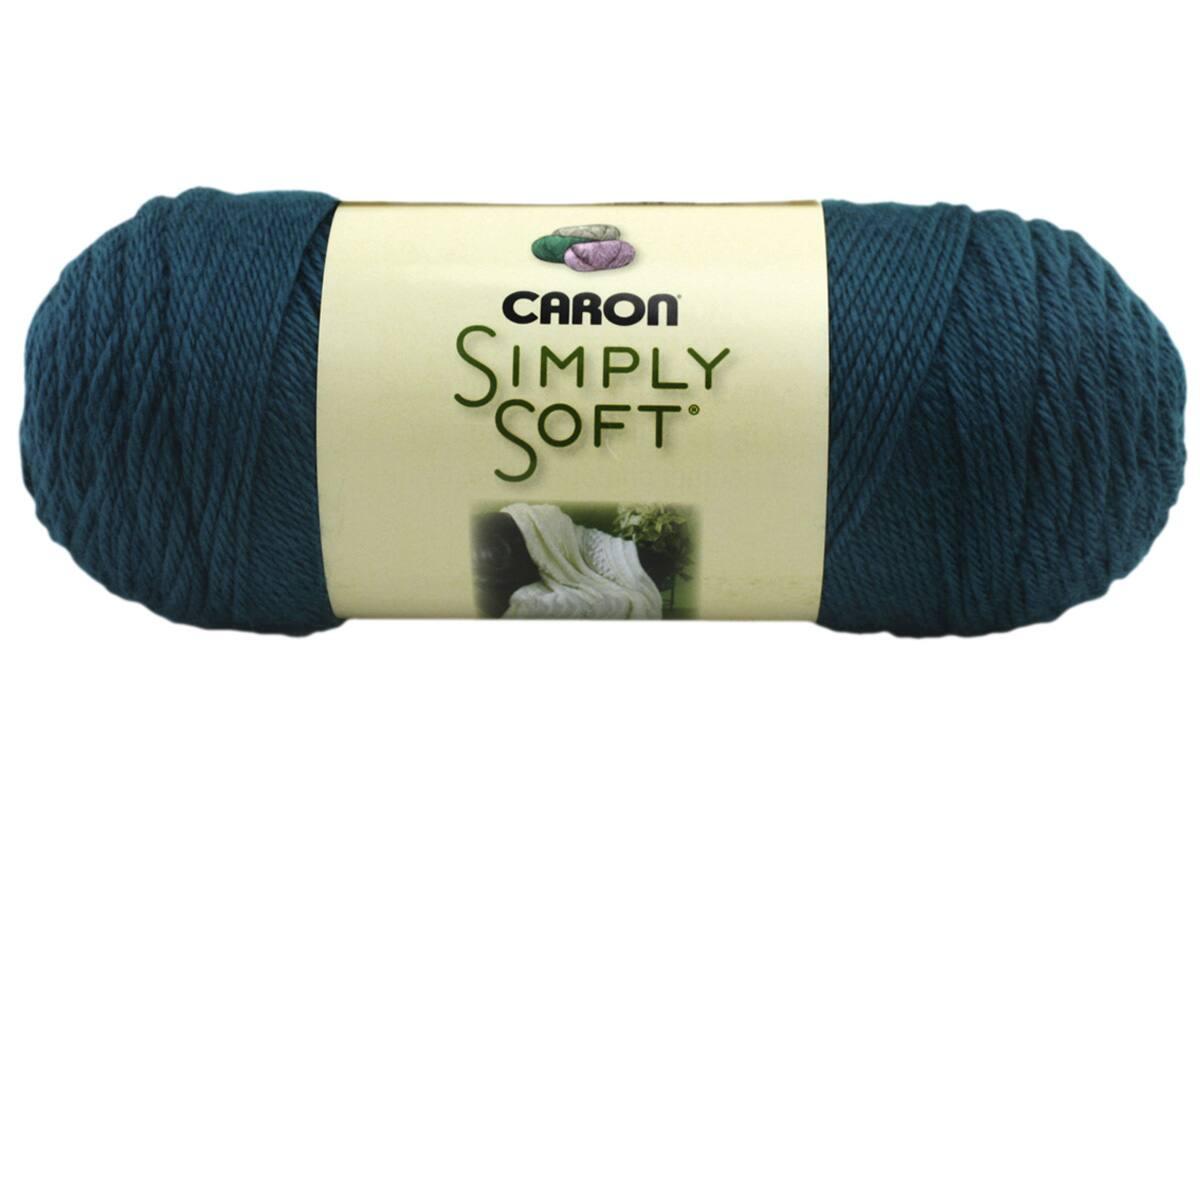 4 Caron Simply Soft Collection Yarn - 6 Oz - Medium Gauge 100/% Acrylic